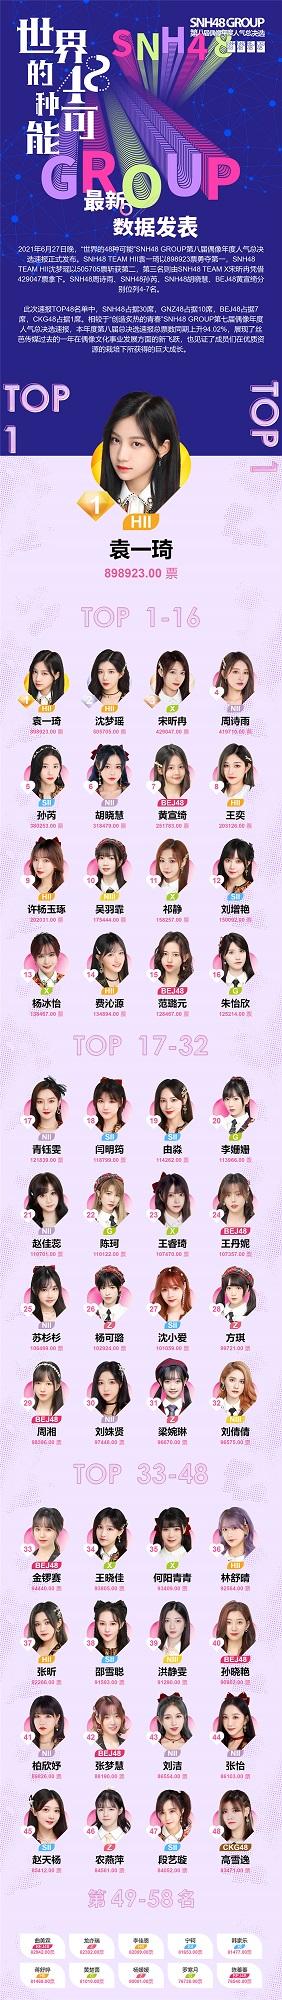 SNH48 GROUP第八届总决选速报发布袁一琦勇夺第一